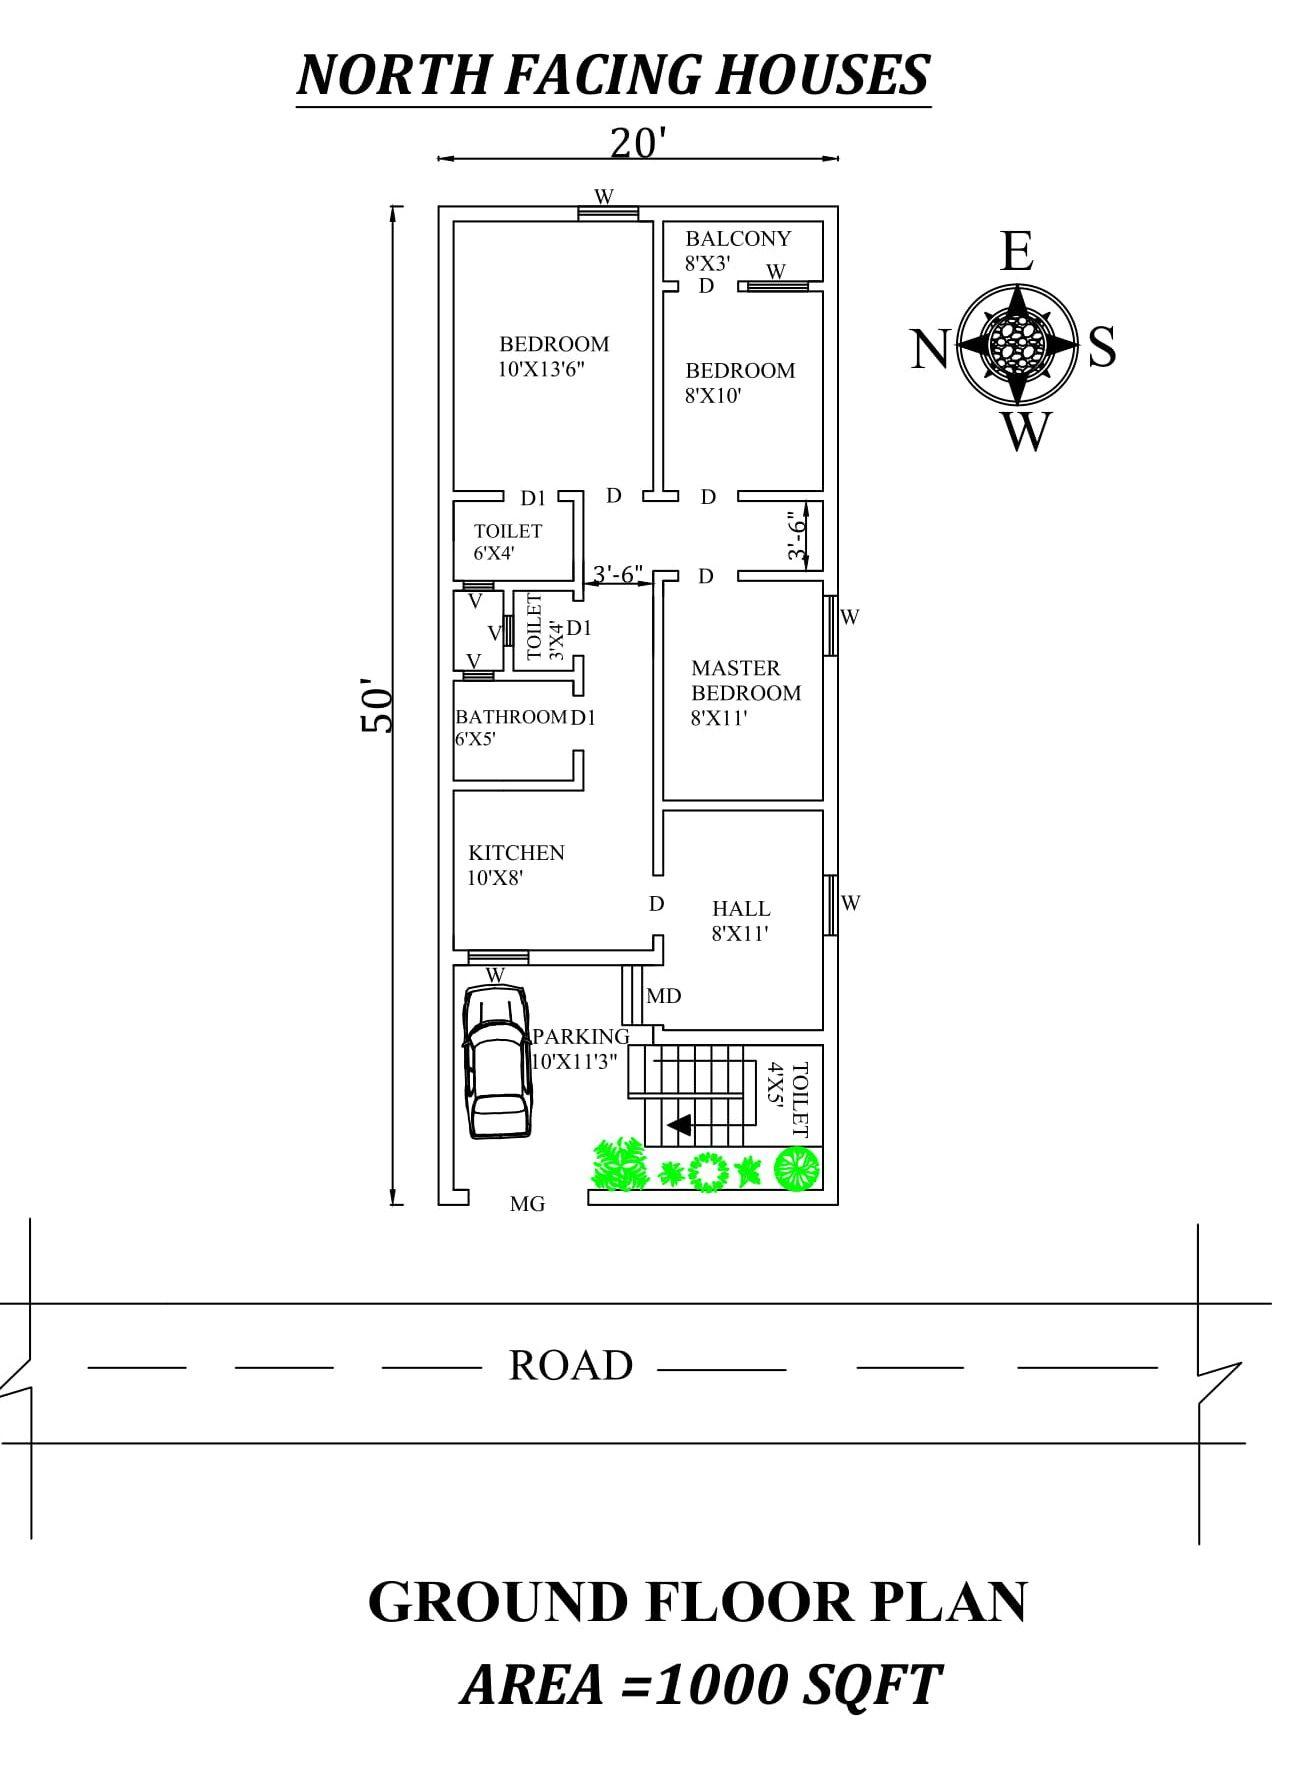 20 X50 Splendid 3bhk North Facing House Plan As Per Vasthu Shastra Autocad Dwg North Facing House 2bhk House Plan 20x40 House Plans